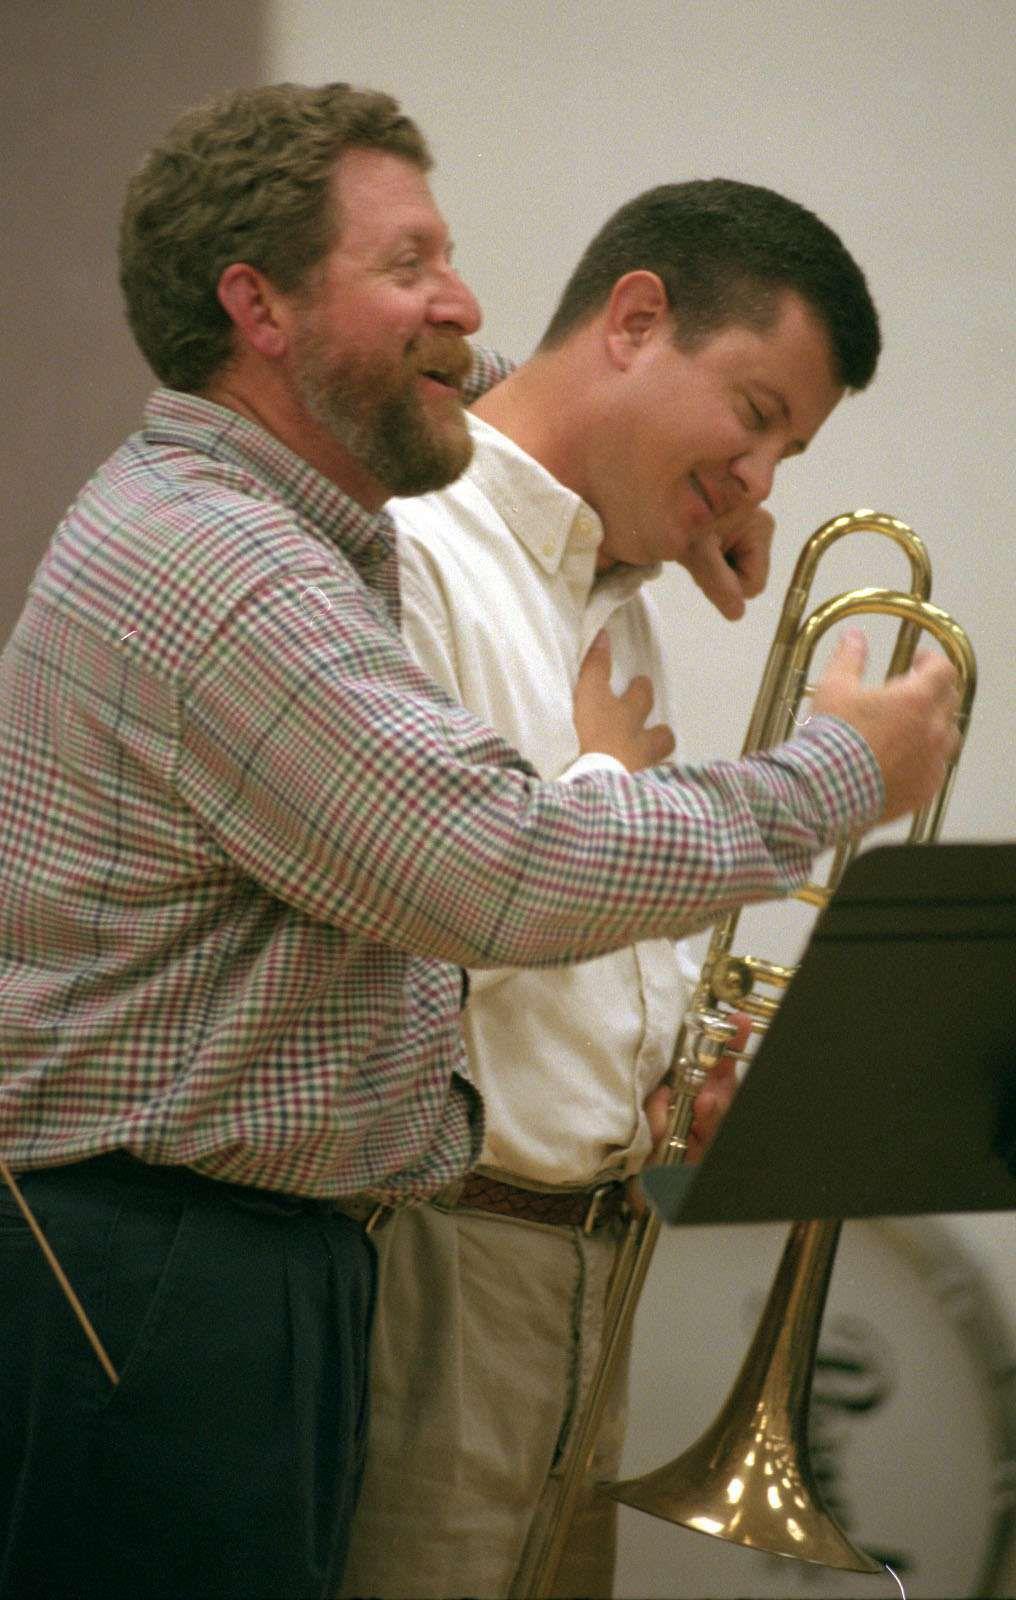 MG Trombone friends 1110.jpg